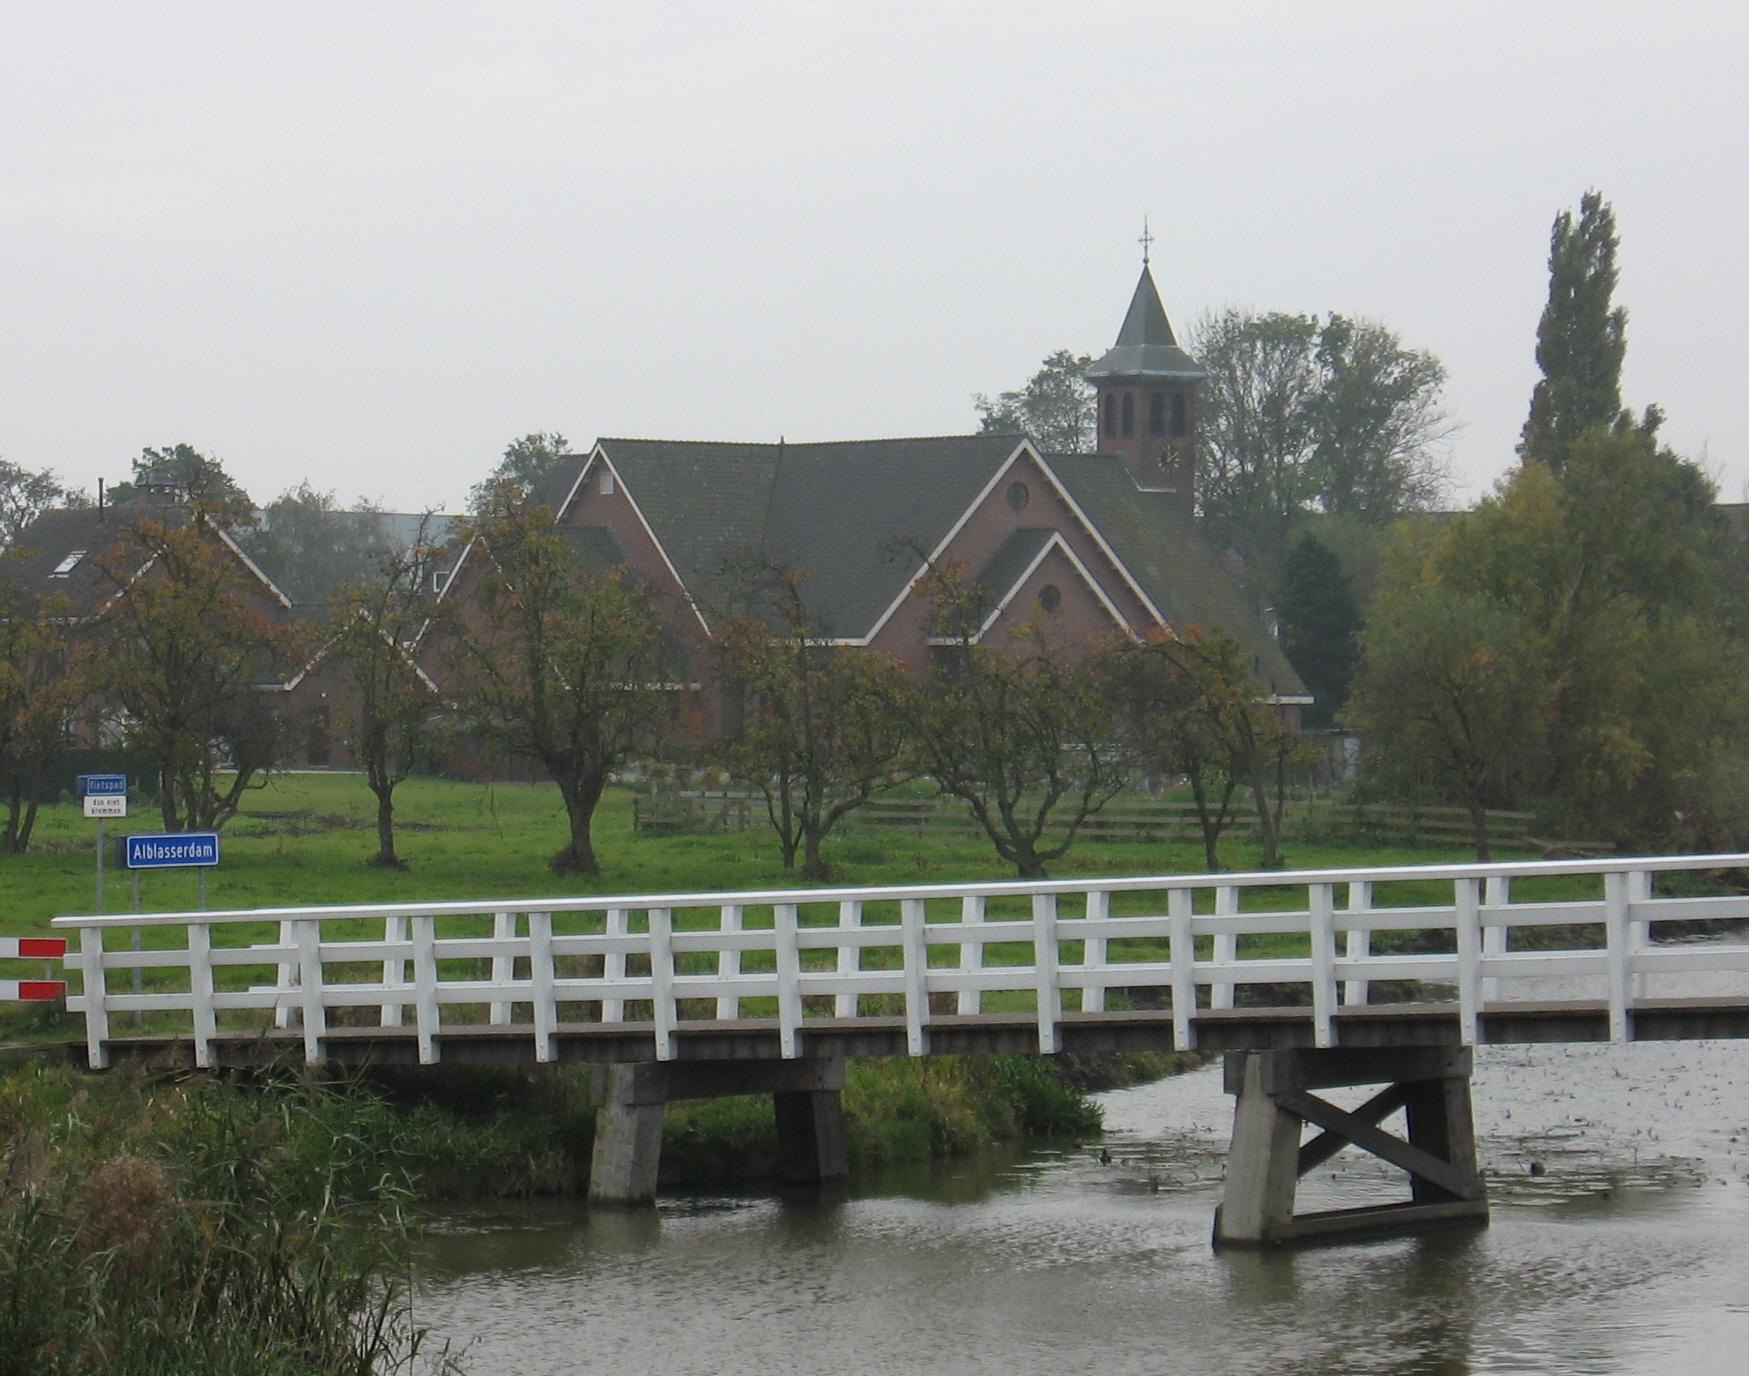 Alblasserdam, Netherlands Postcodes - World Postal Code